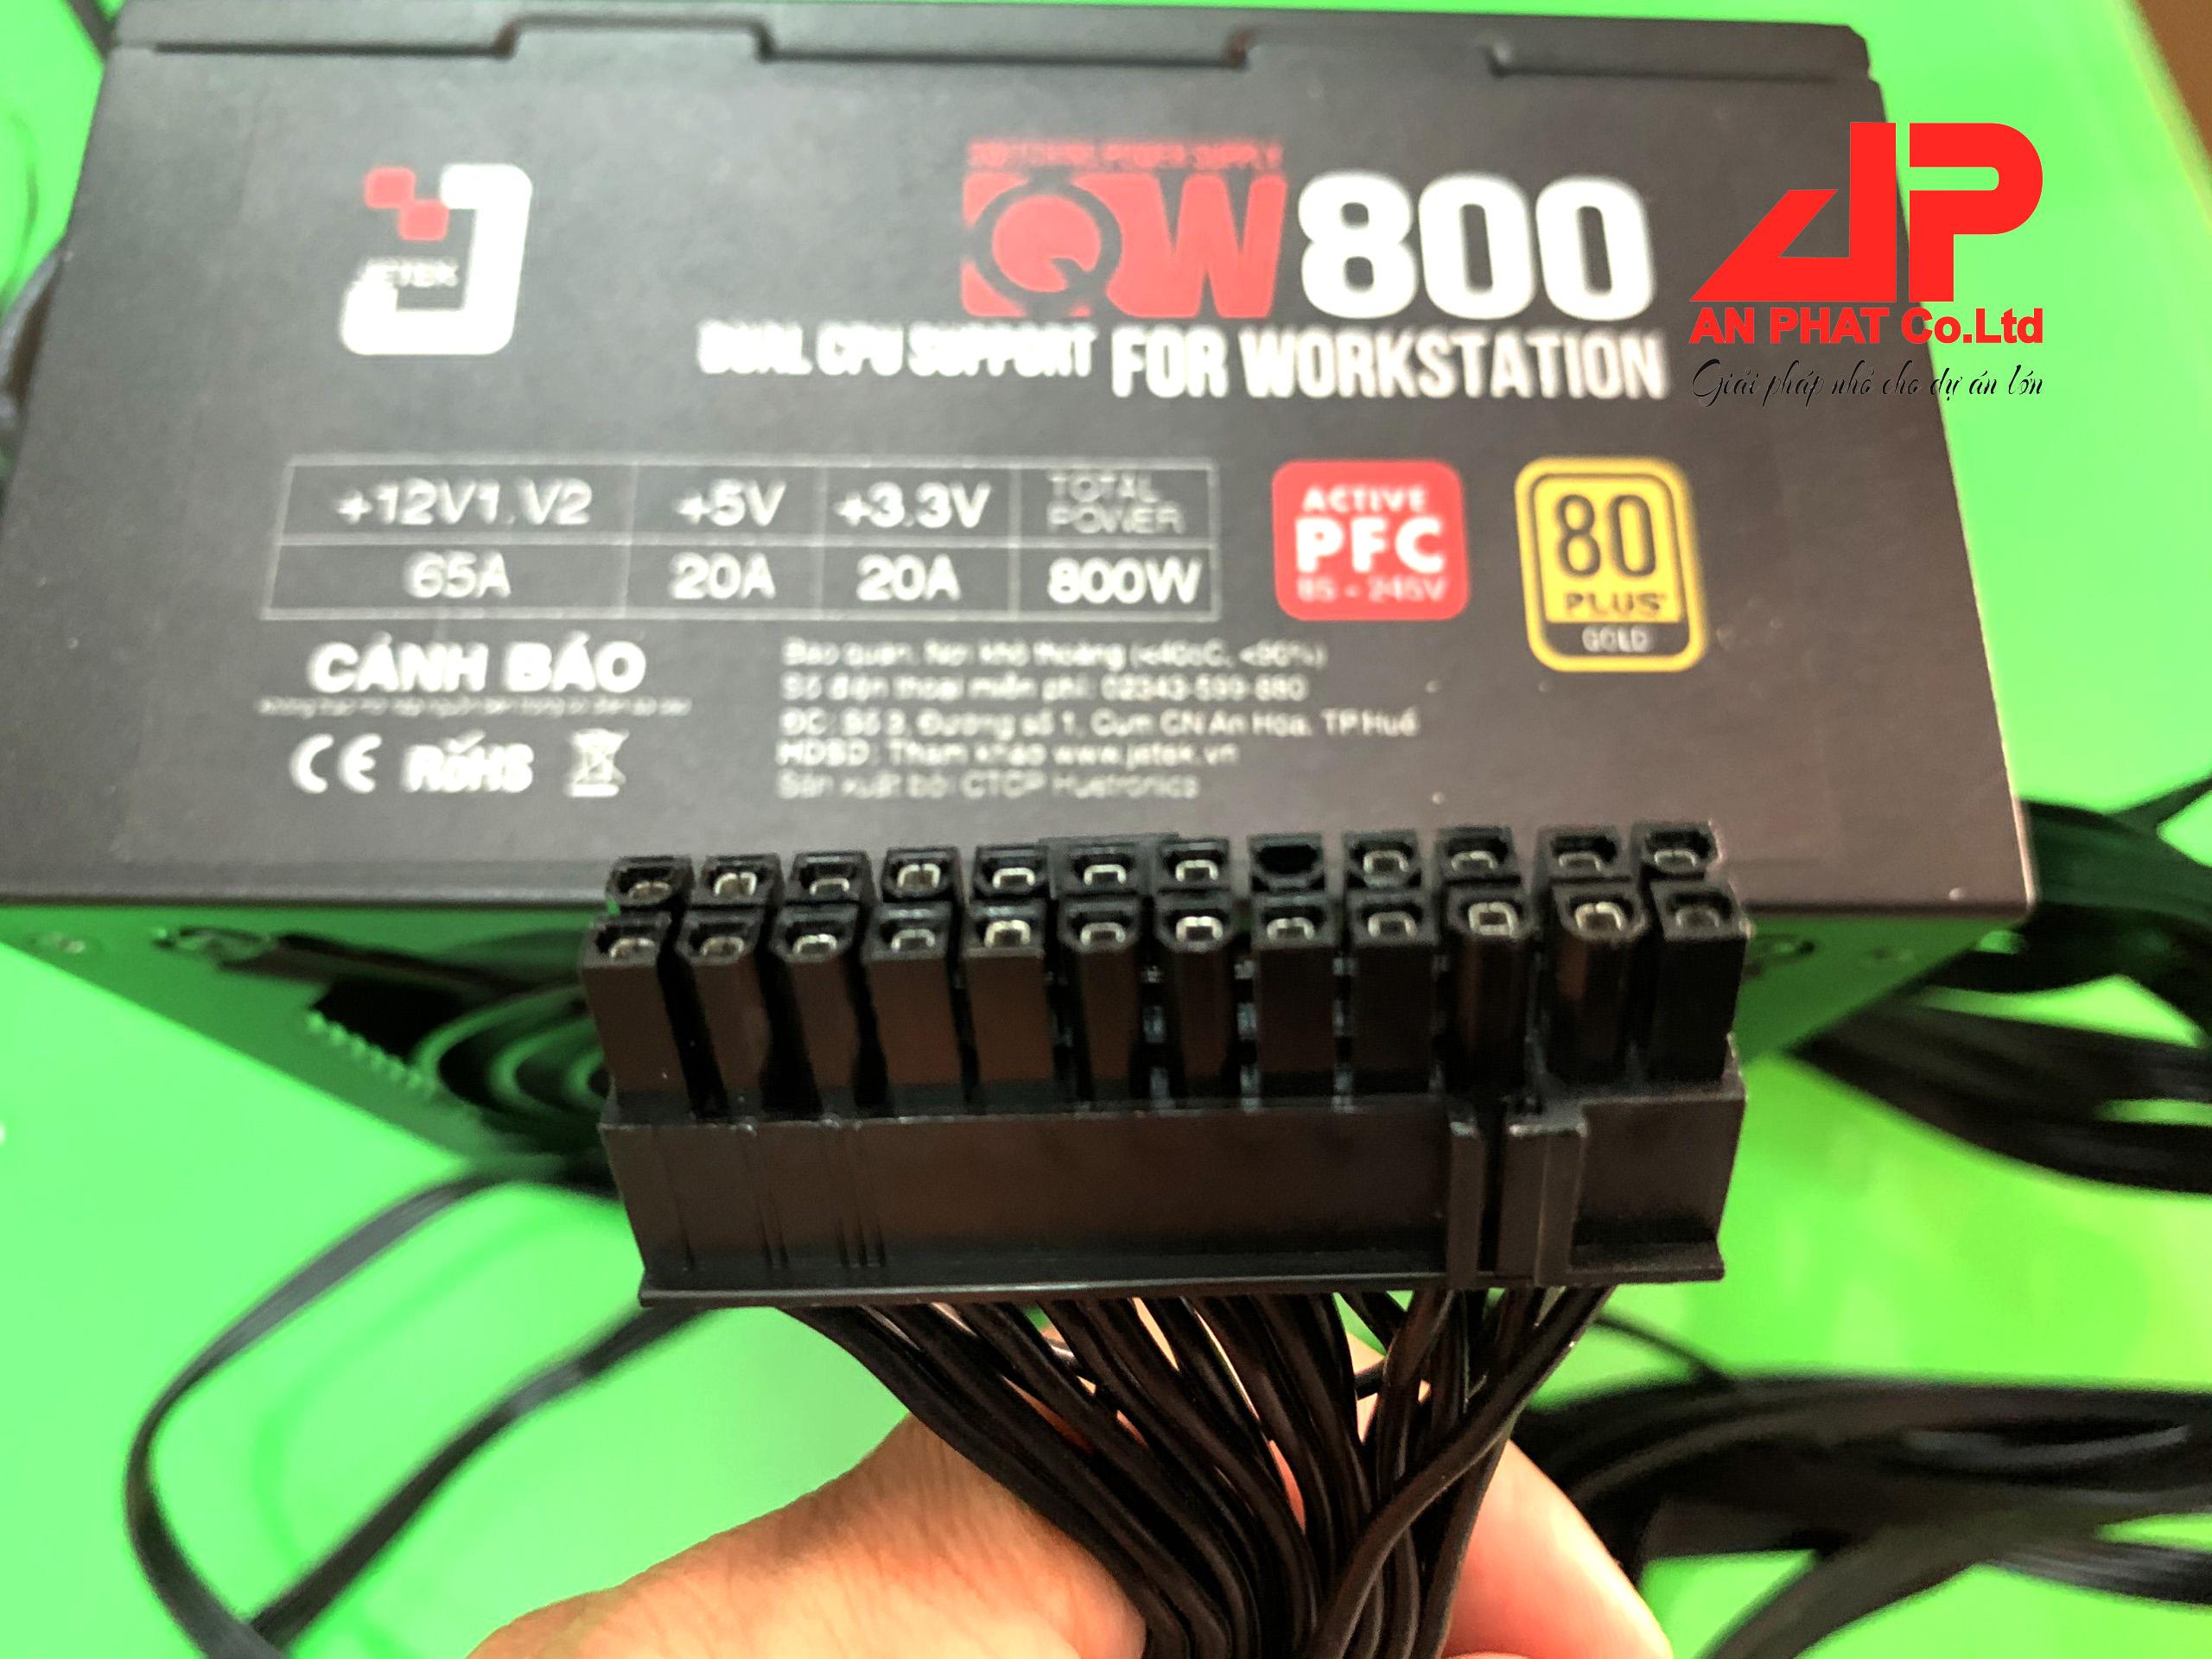 JETEK QW800 for wts